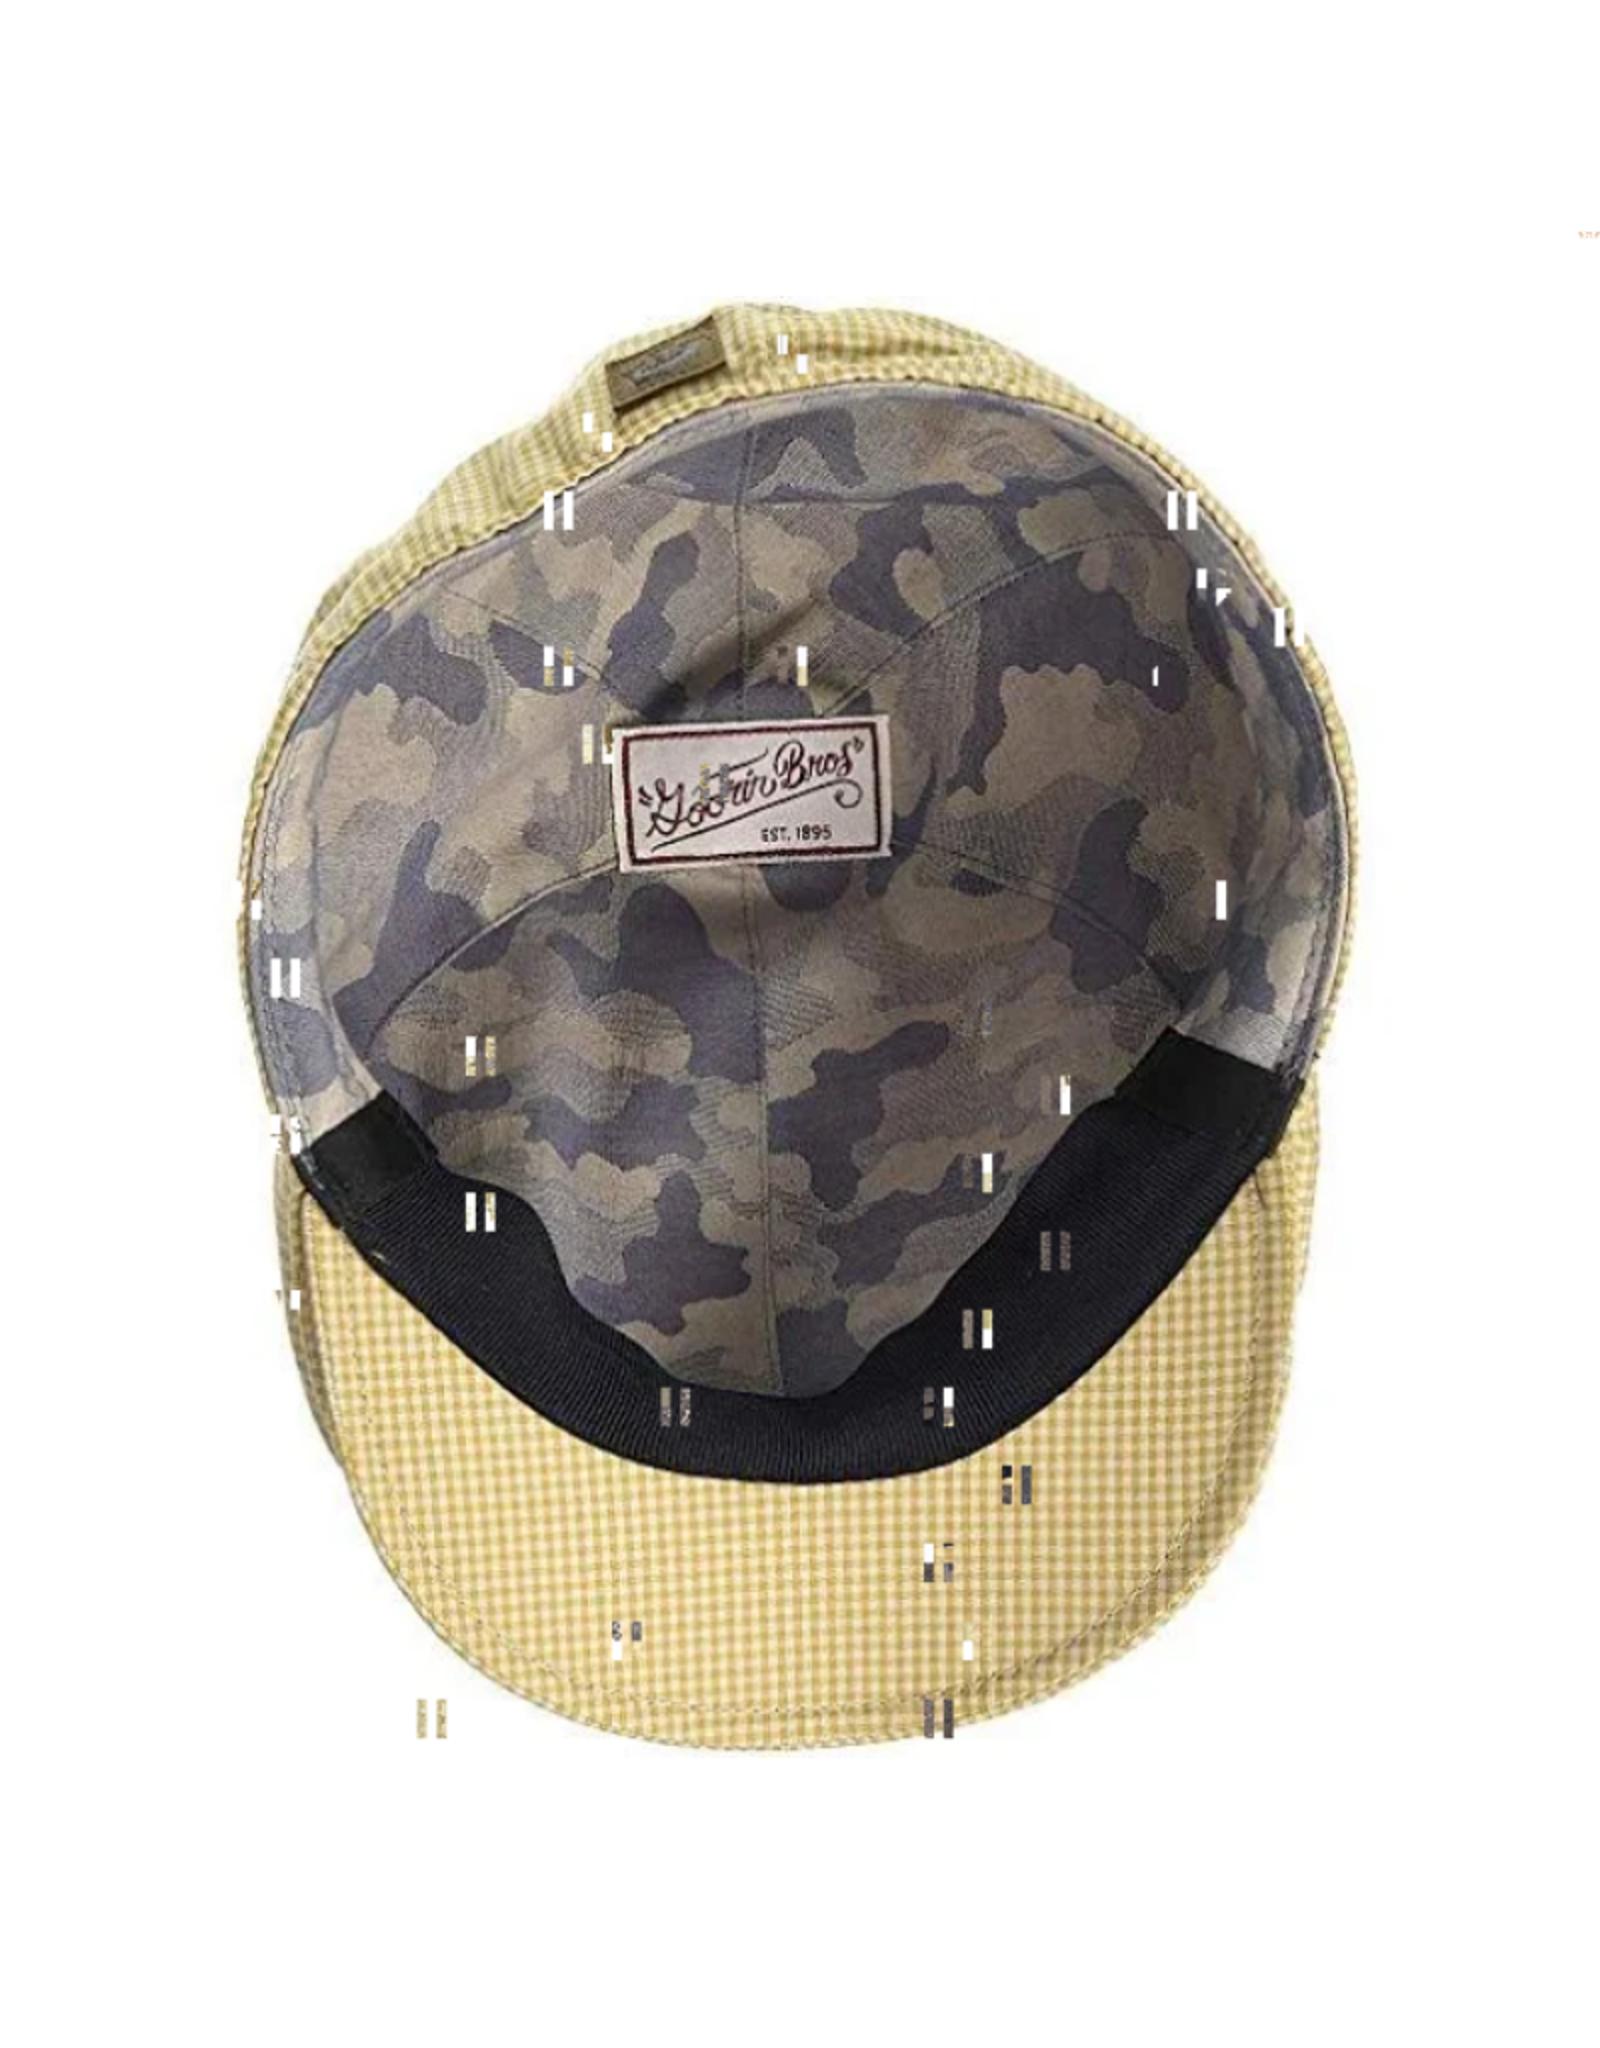 HAT-IVY CAP-GINGHAM STYLE